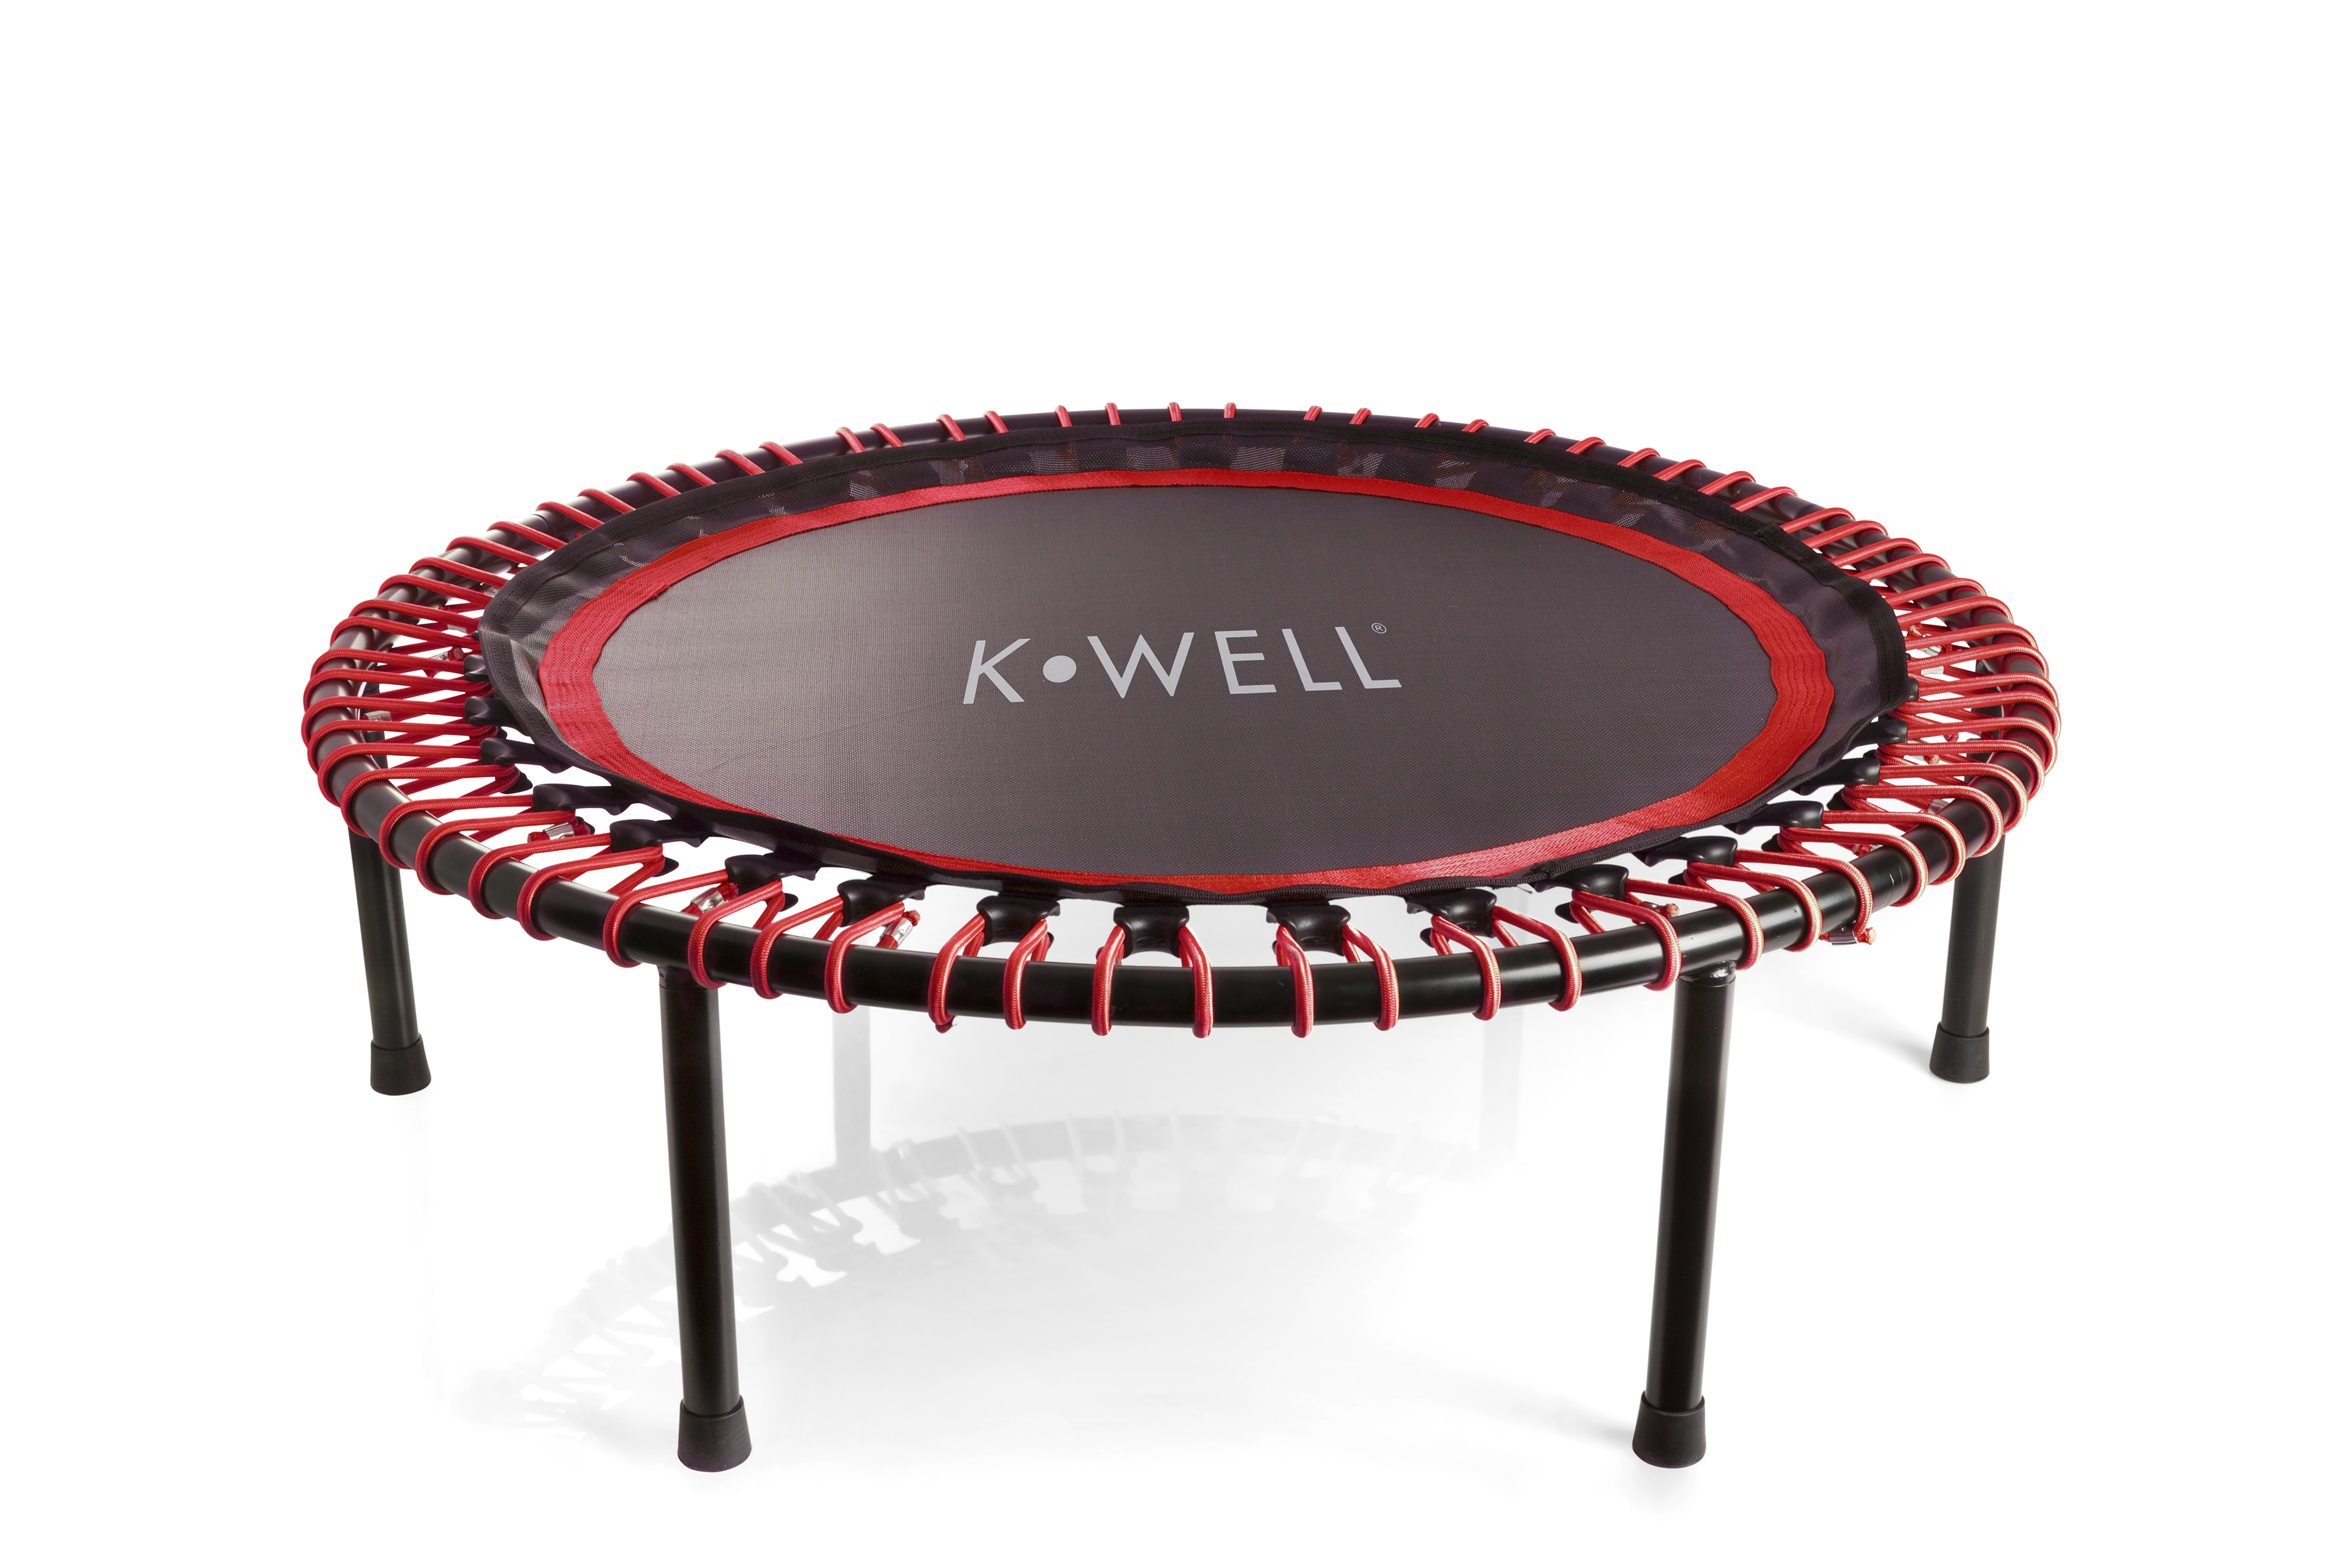 Kwell Trampoline